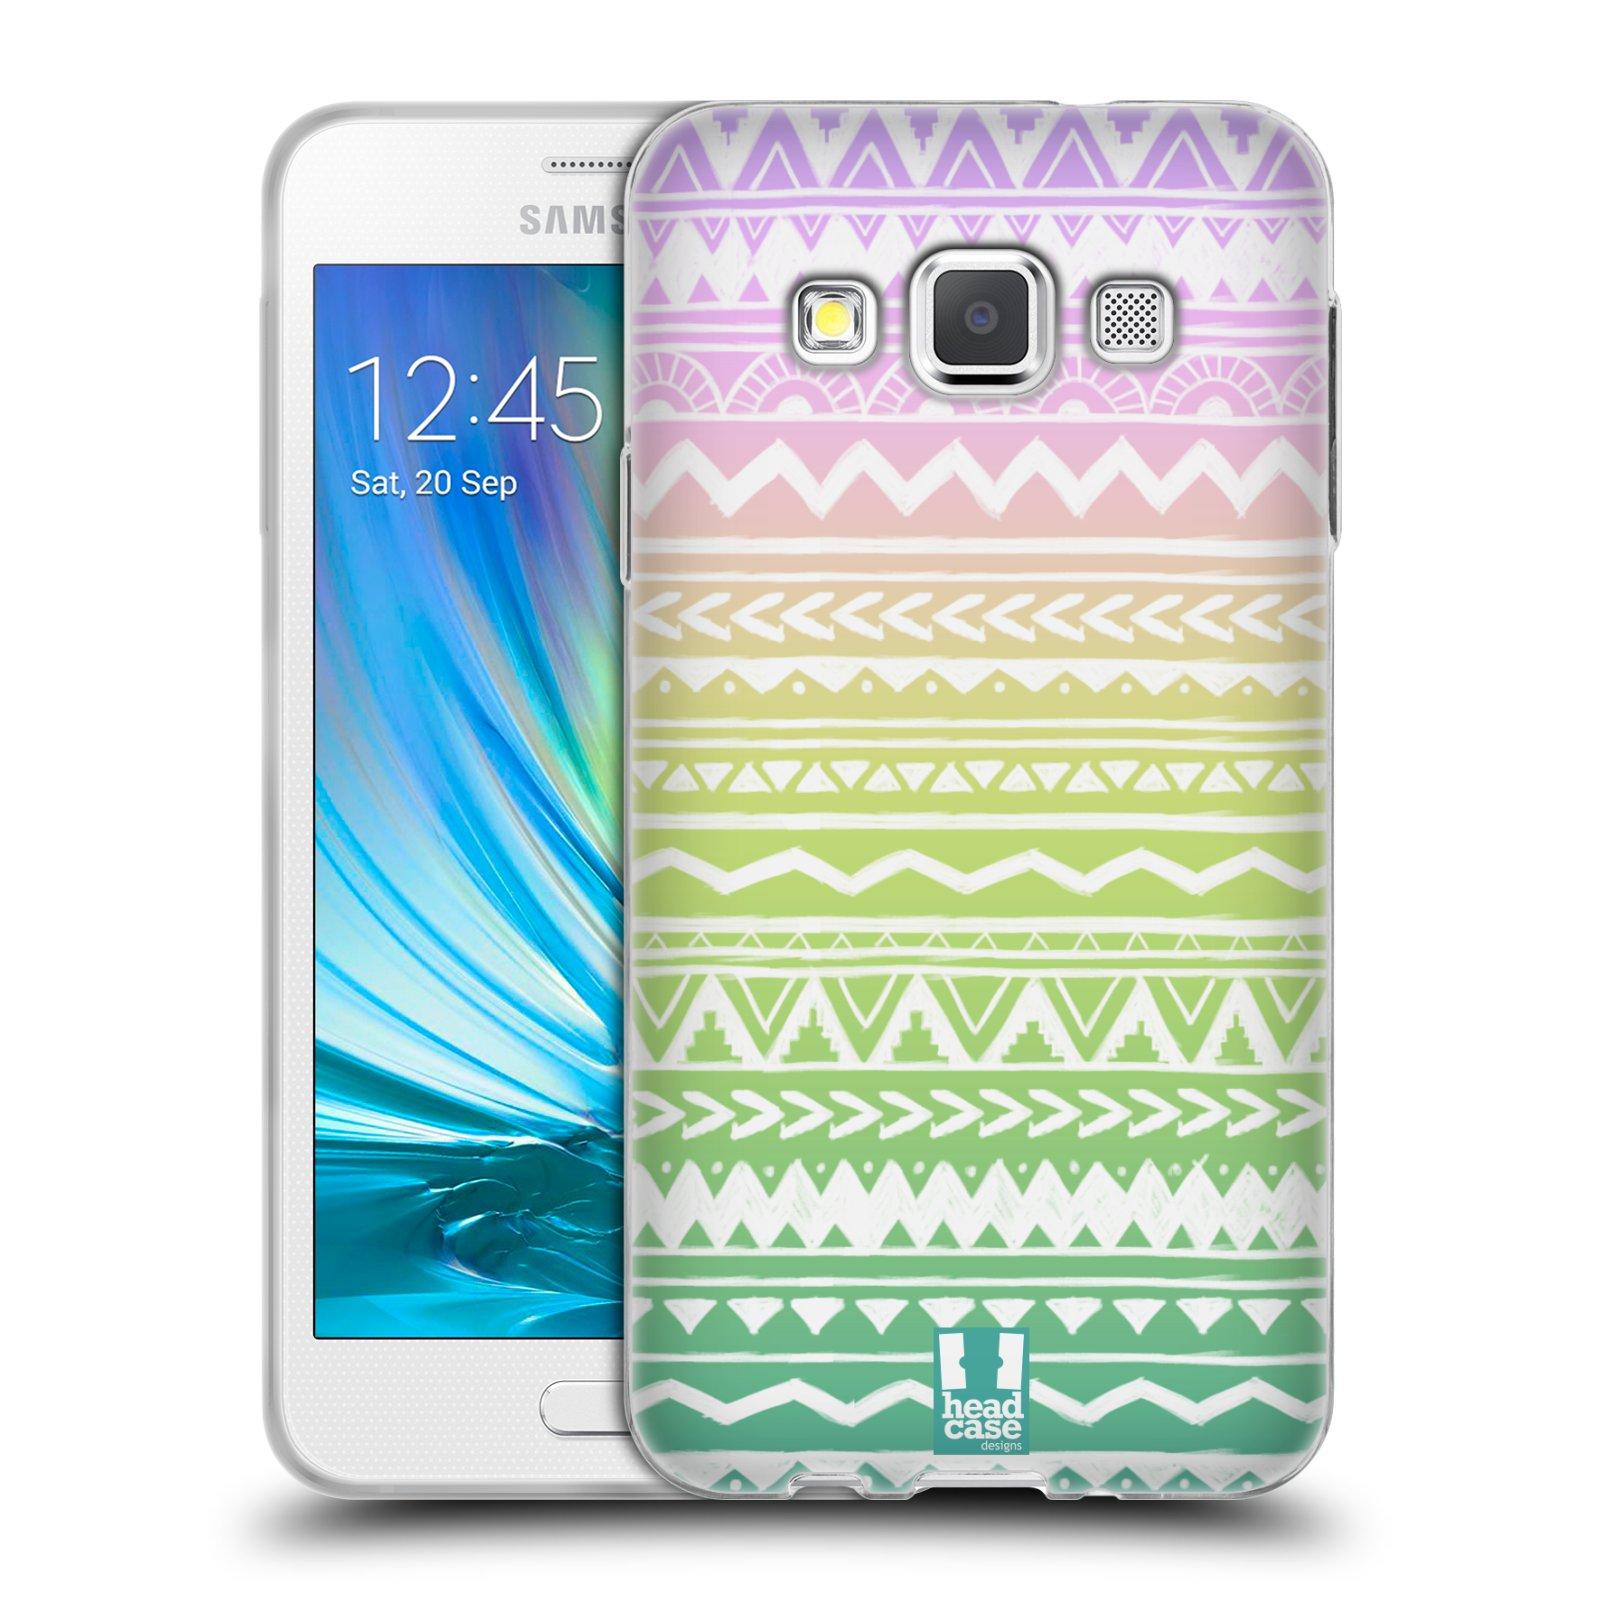 Silikonové pouzdro na mobil Samsung Galaxy A3 HEAD CASE MIX AZTEC DRAWN